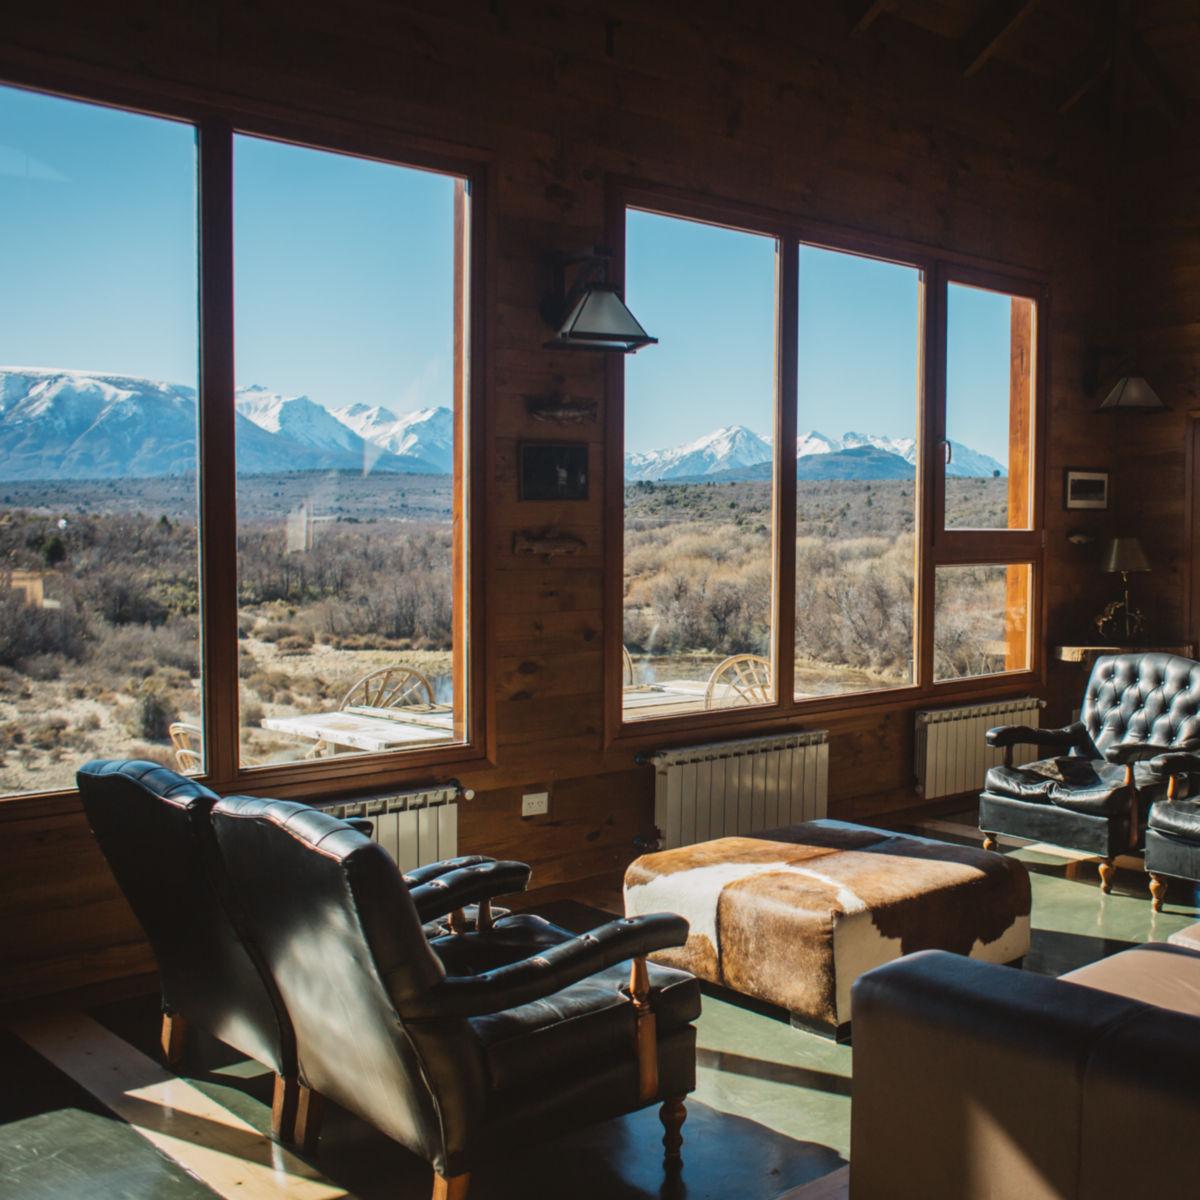 Carrileufu River Lodge, Argentina - image number 0